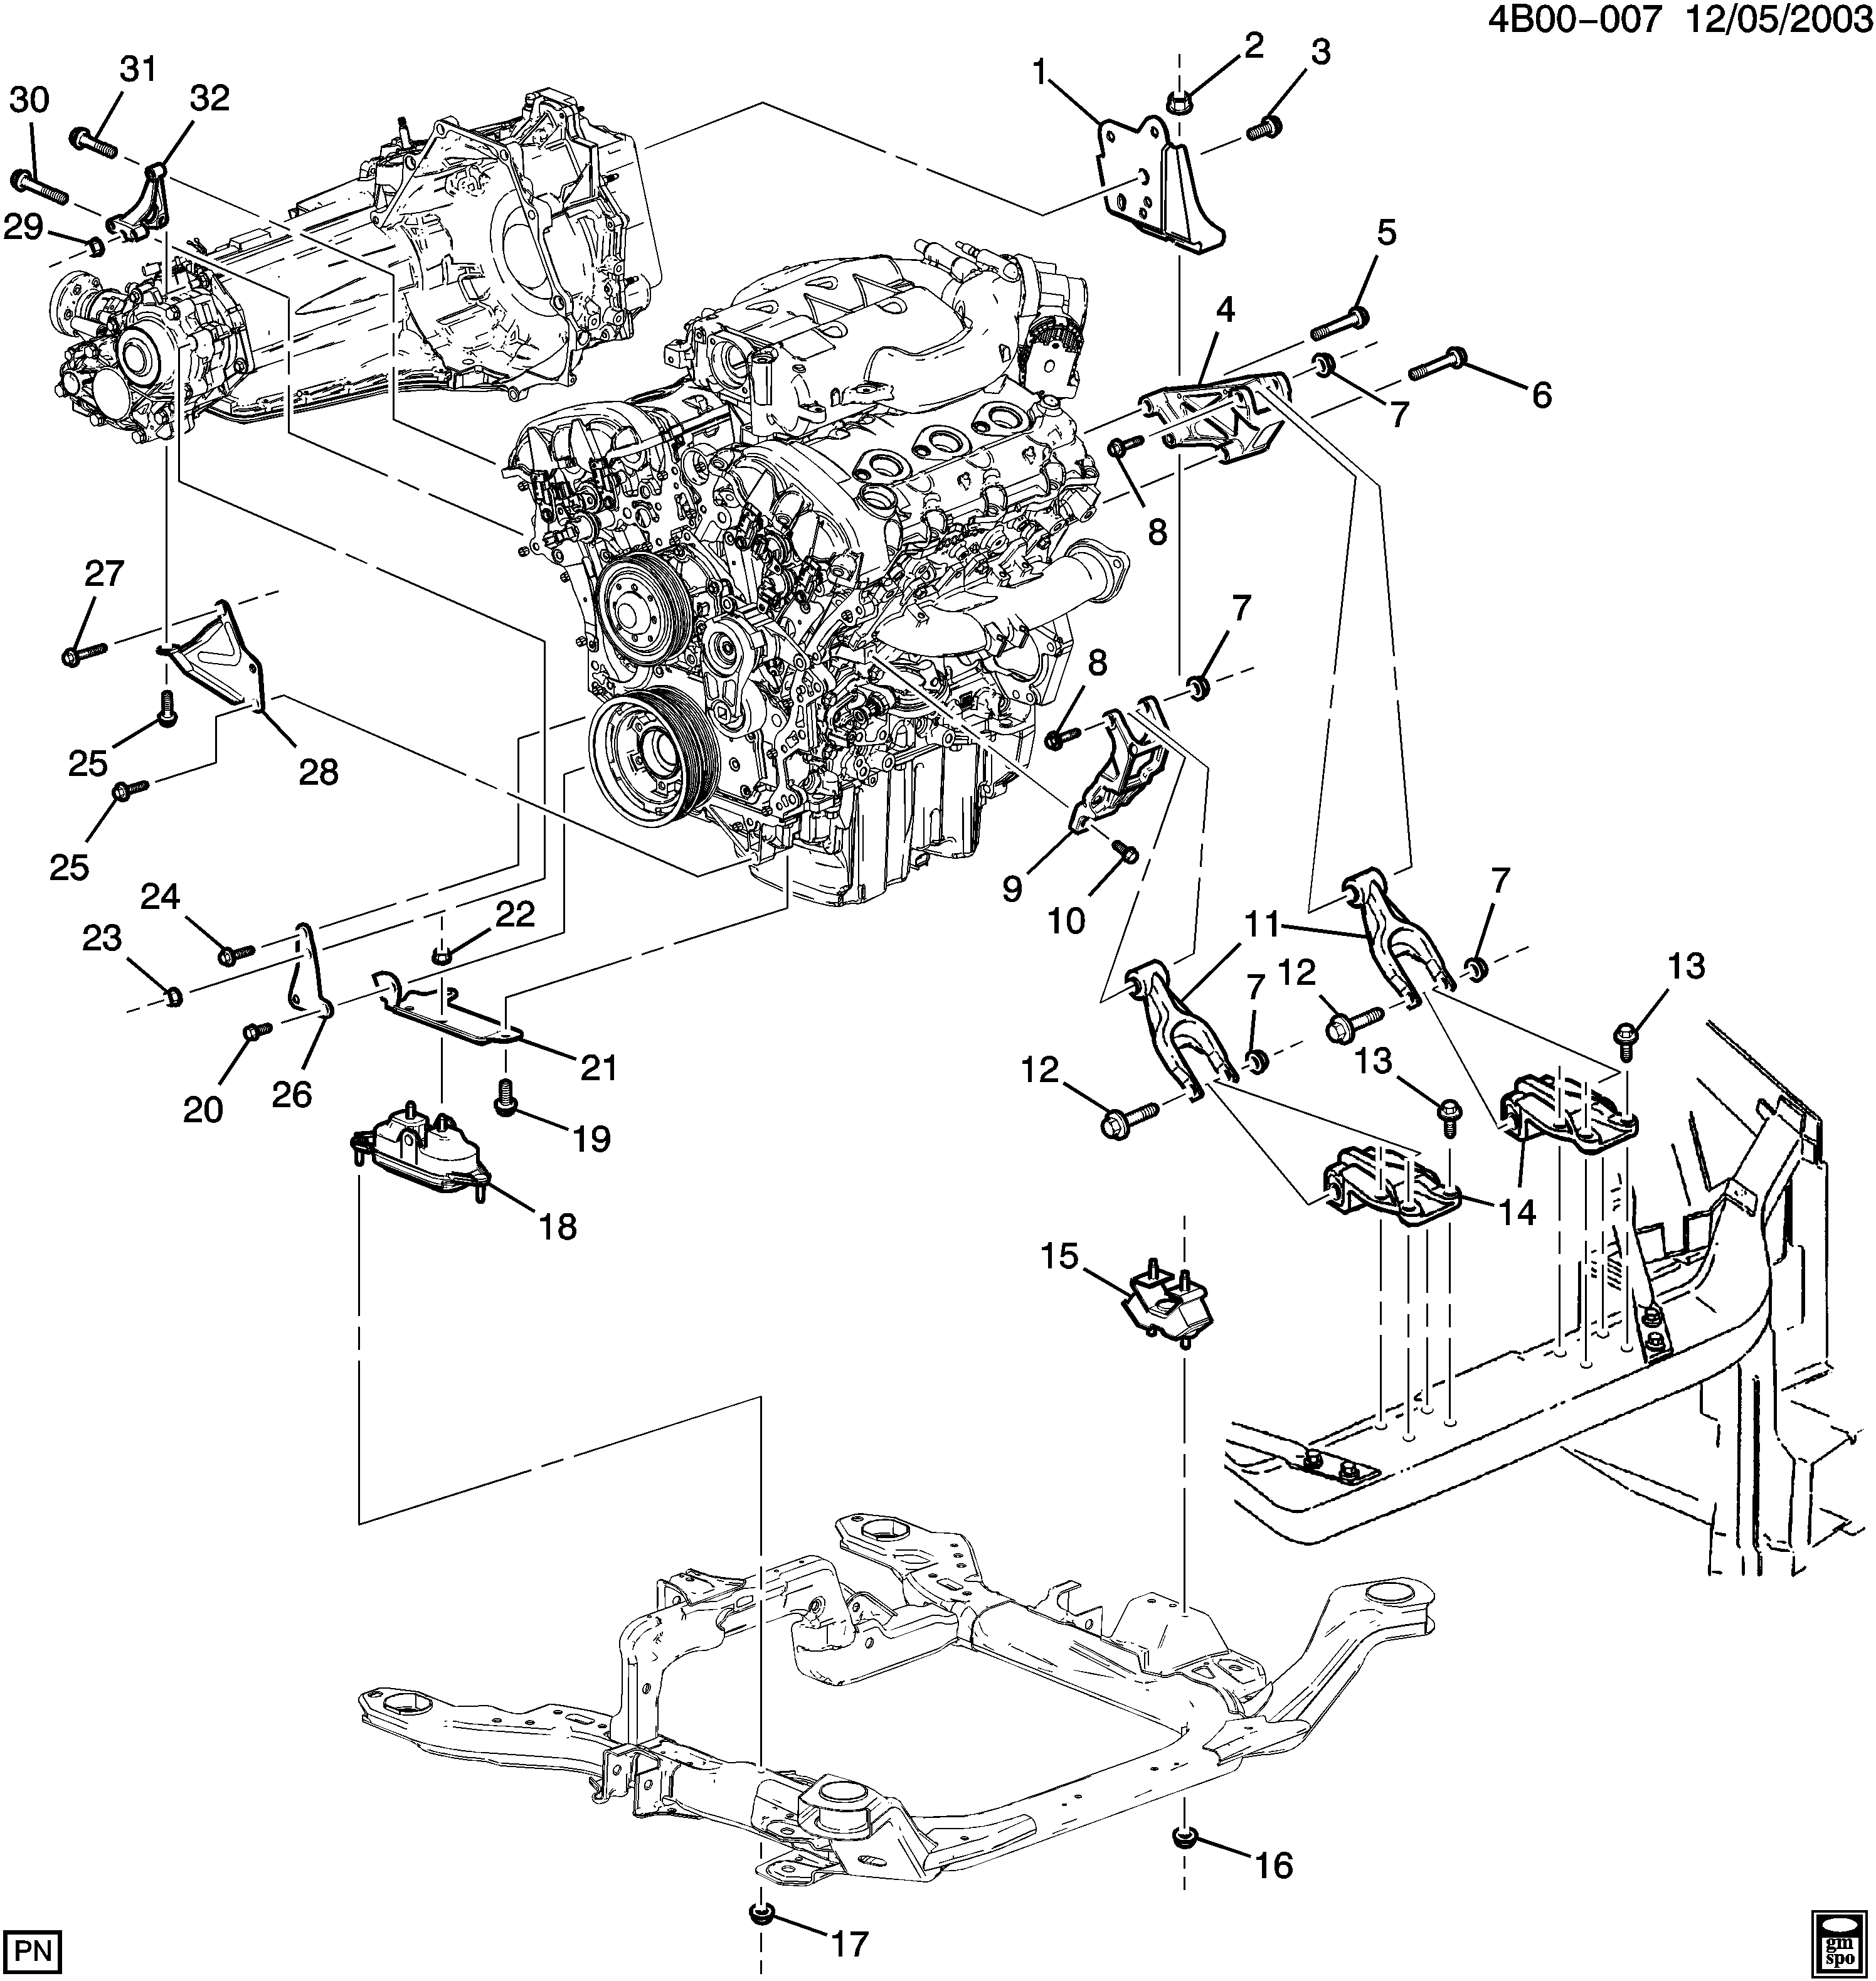 buick rendezvous engine diagram | wiring diagram computing  ecator